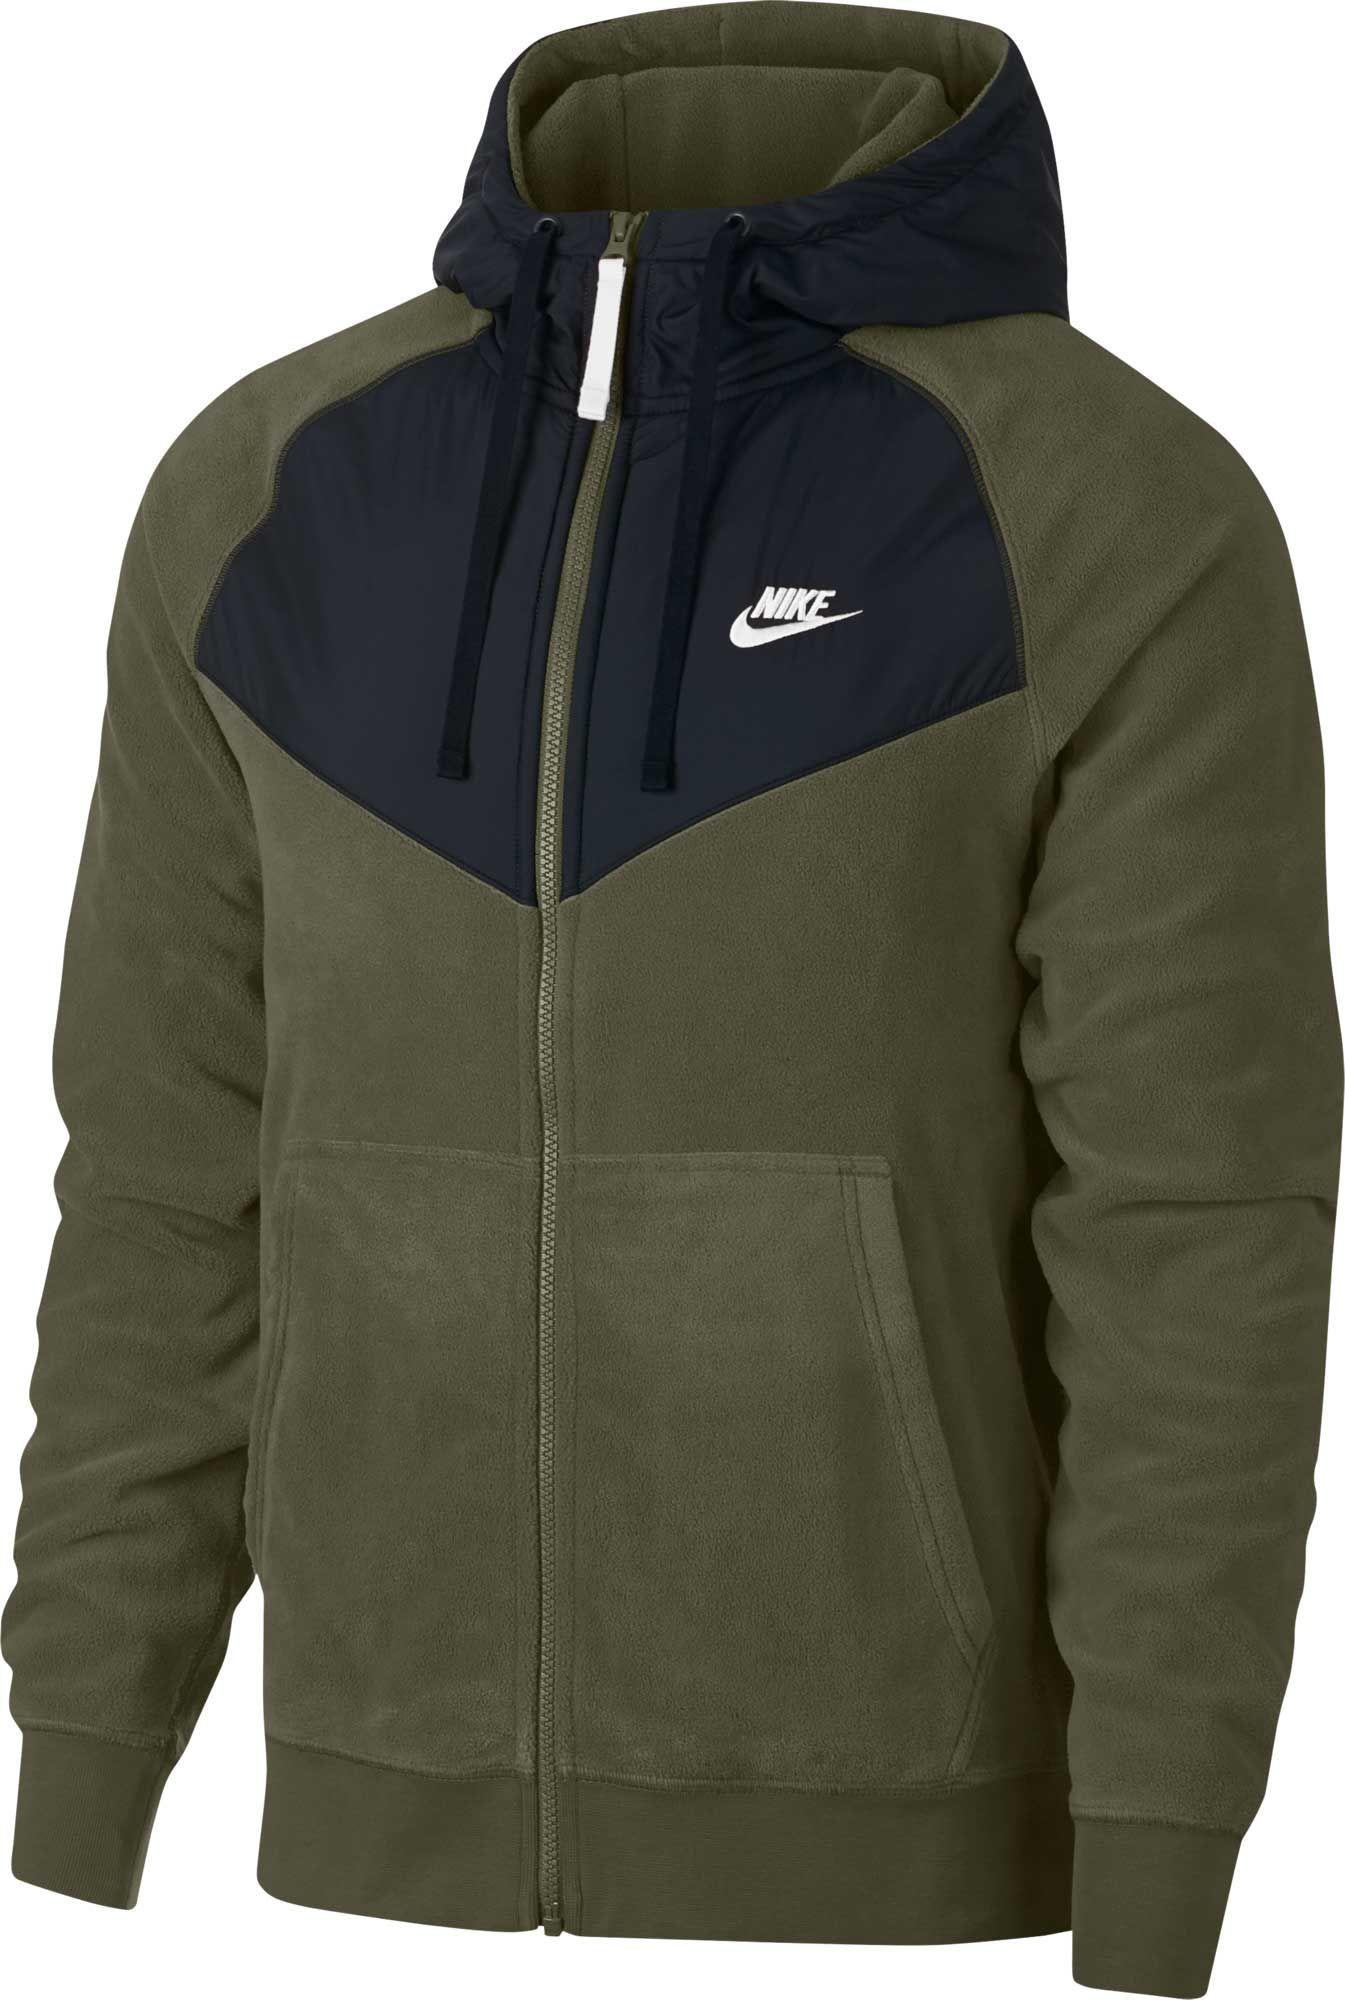 8192728ab Nike Men's Sportswear Windrunner Full-Zip Hoodie in 2019 | Products ...